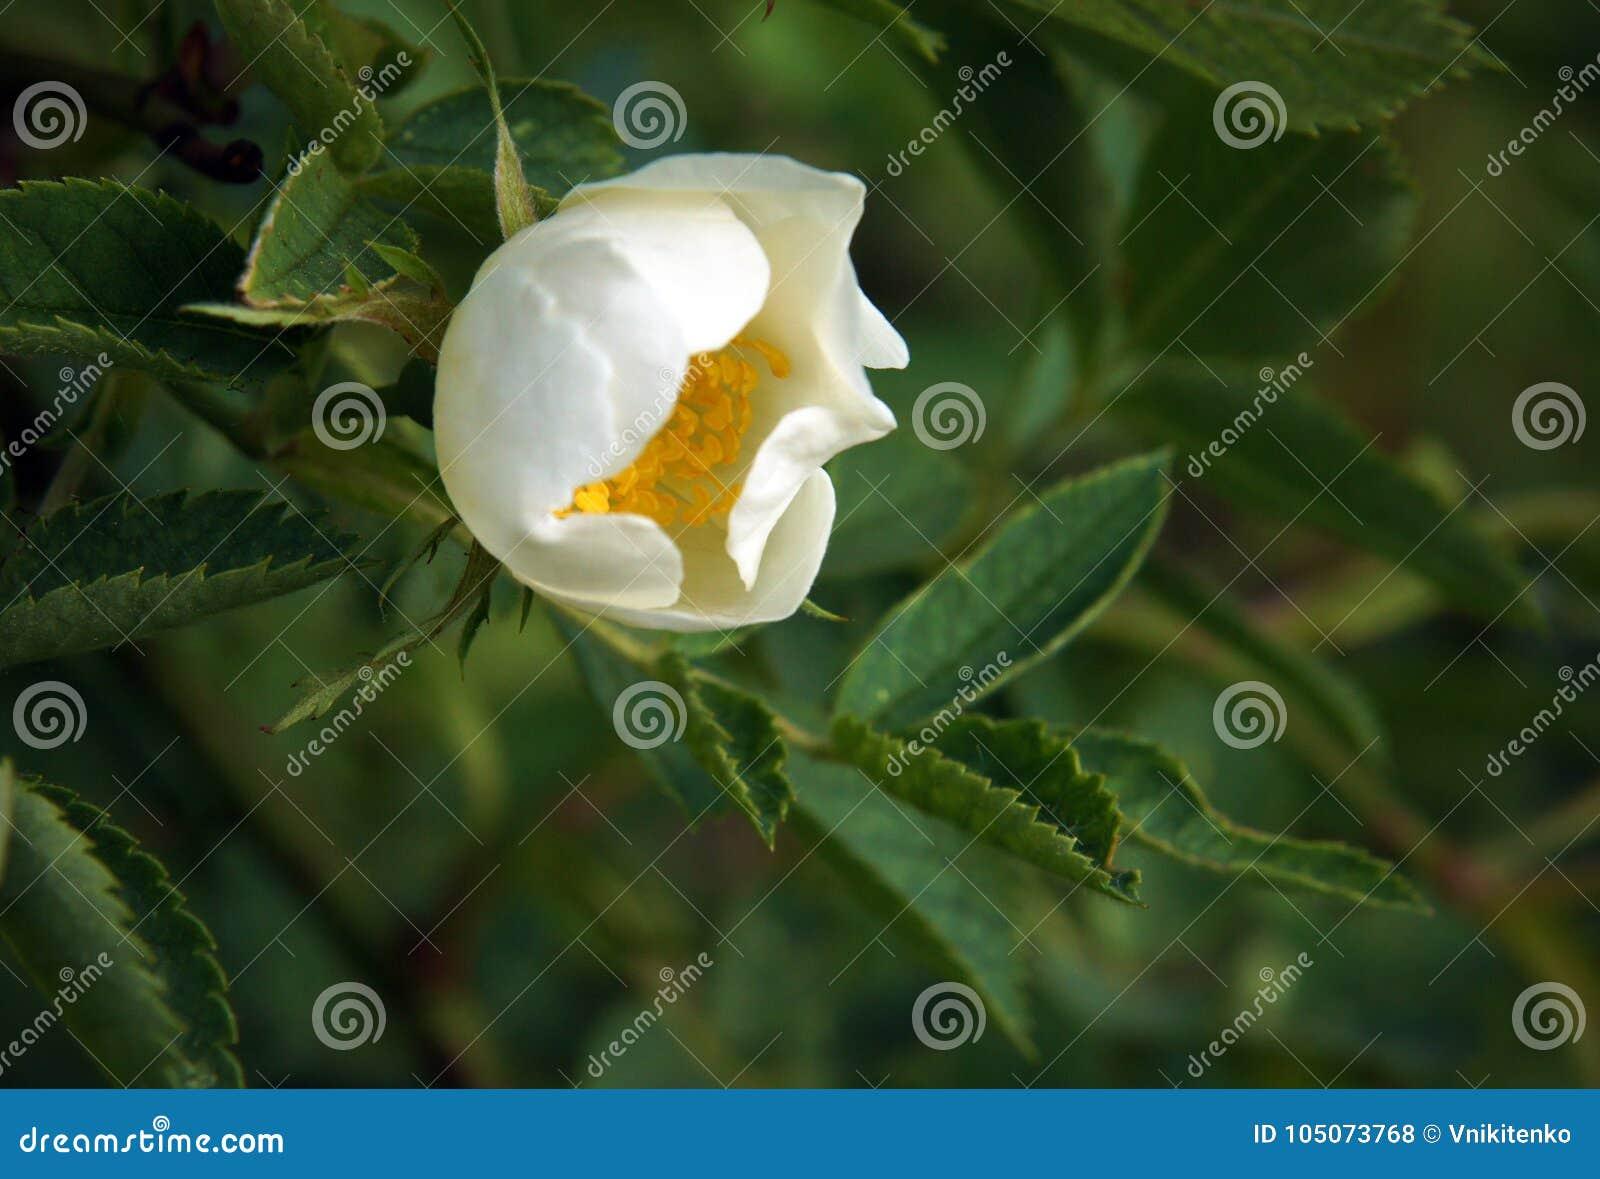 White Flowers Of Dog Rose Stock Photo Image Of Beauty 105073768